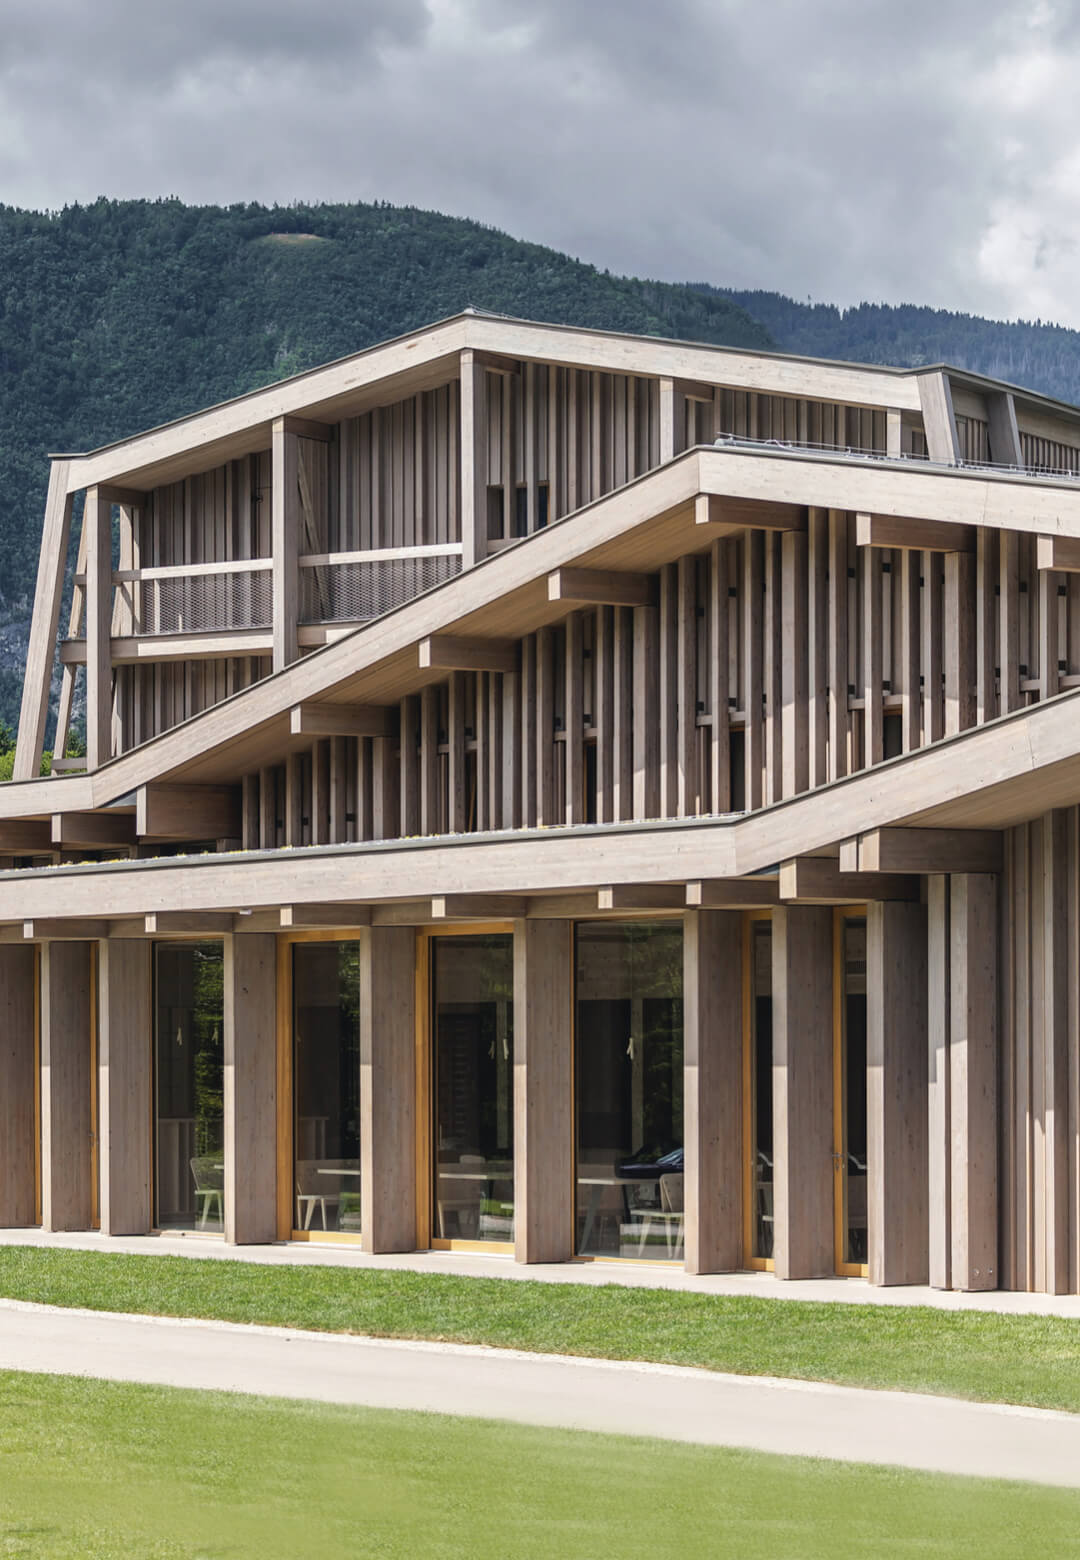 OFIS Architects have renovated Hotel Bohinj within Triglav National Park in Slovenia   Hotel Bohinj Revitalisation by OFIS Architects   STIRworld